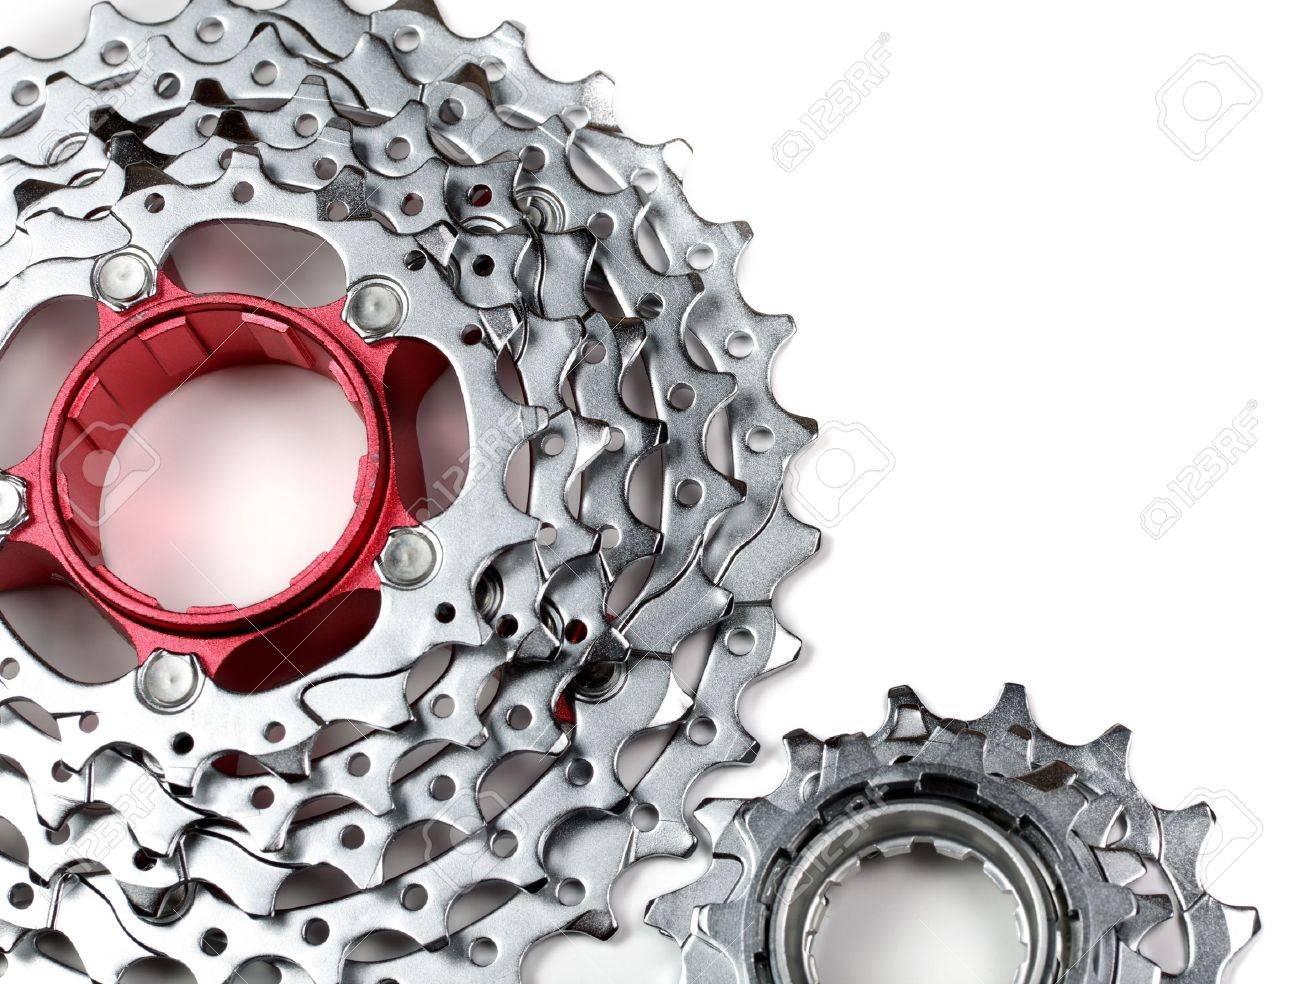 Mountain bike rear cassette on white background Stock Photo - 11293881